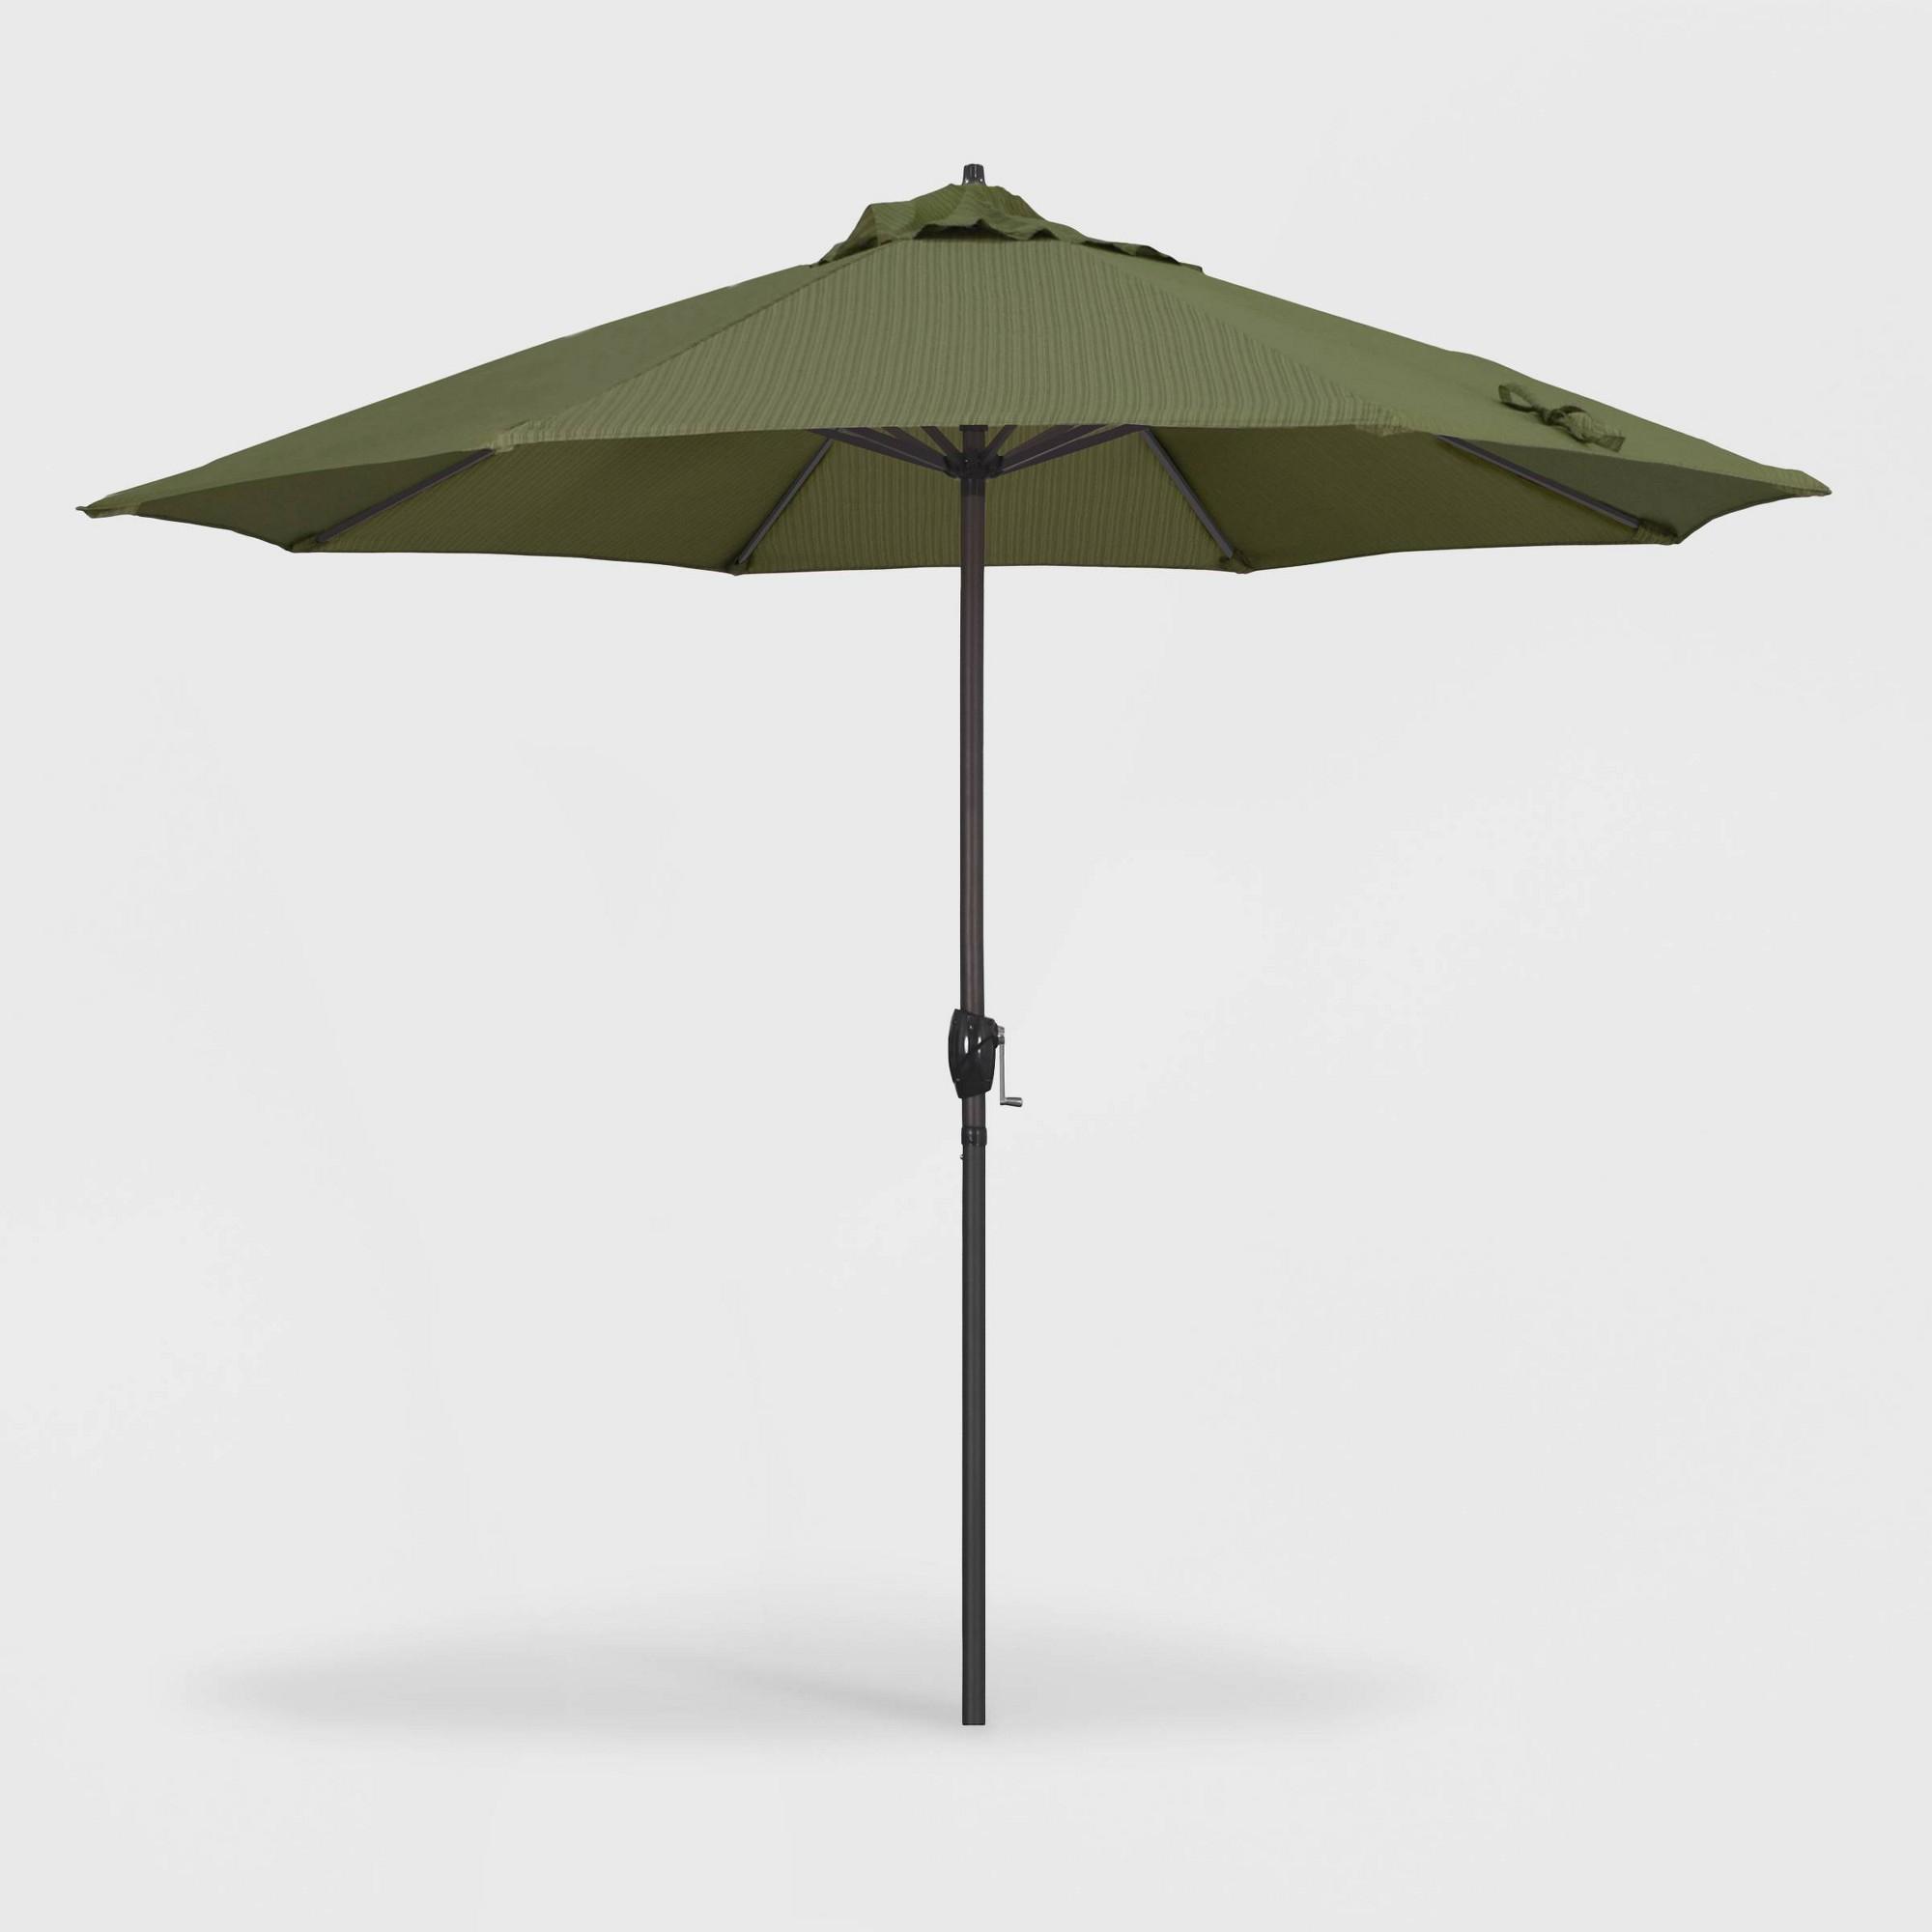 Latest 9' Casa Patio Umbrella Auto Tilt Crank Lift – Olefin Terrace Fern Throughout Crediton Market Umbrellas (View 12 of 20)